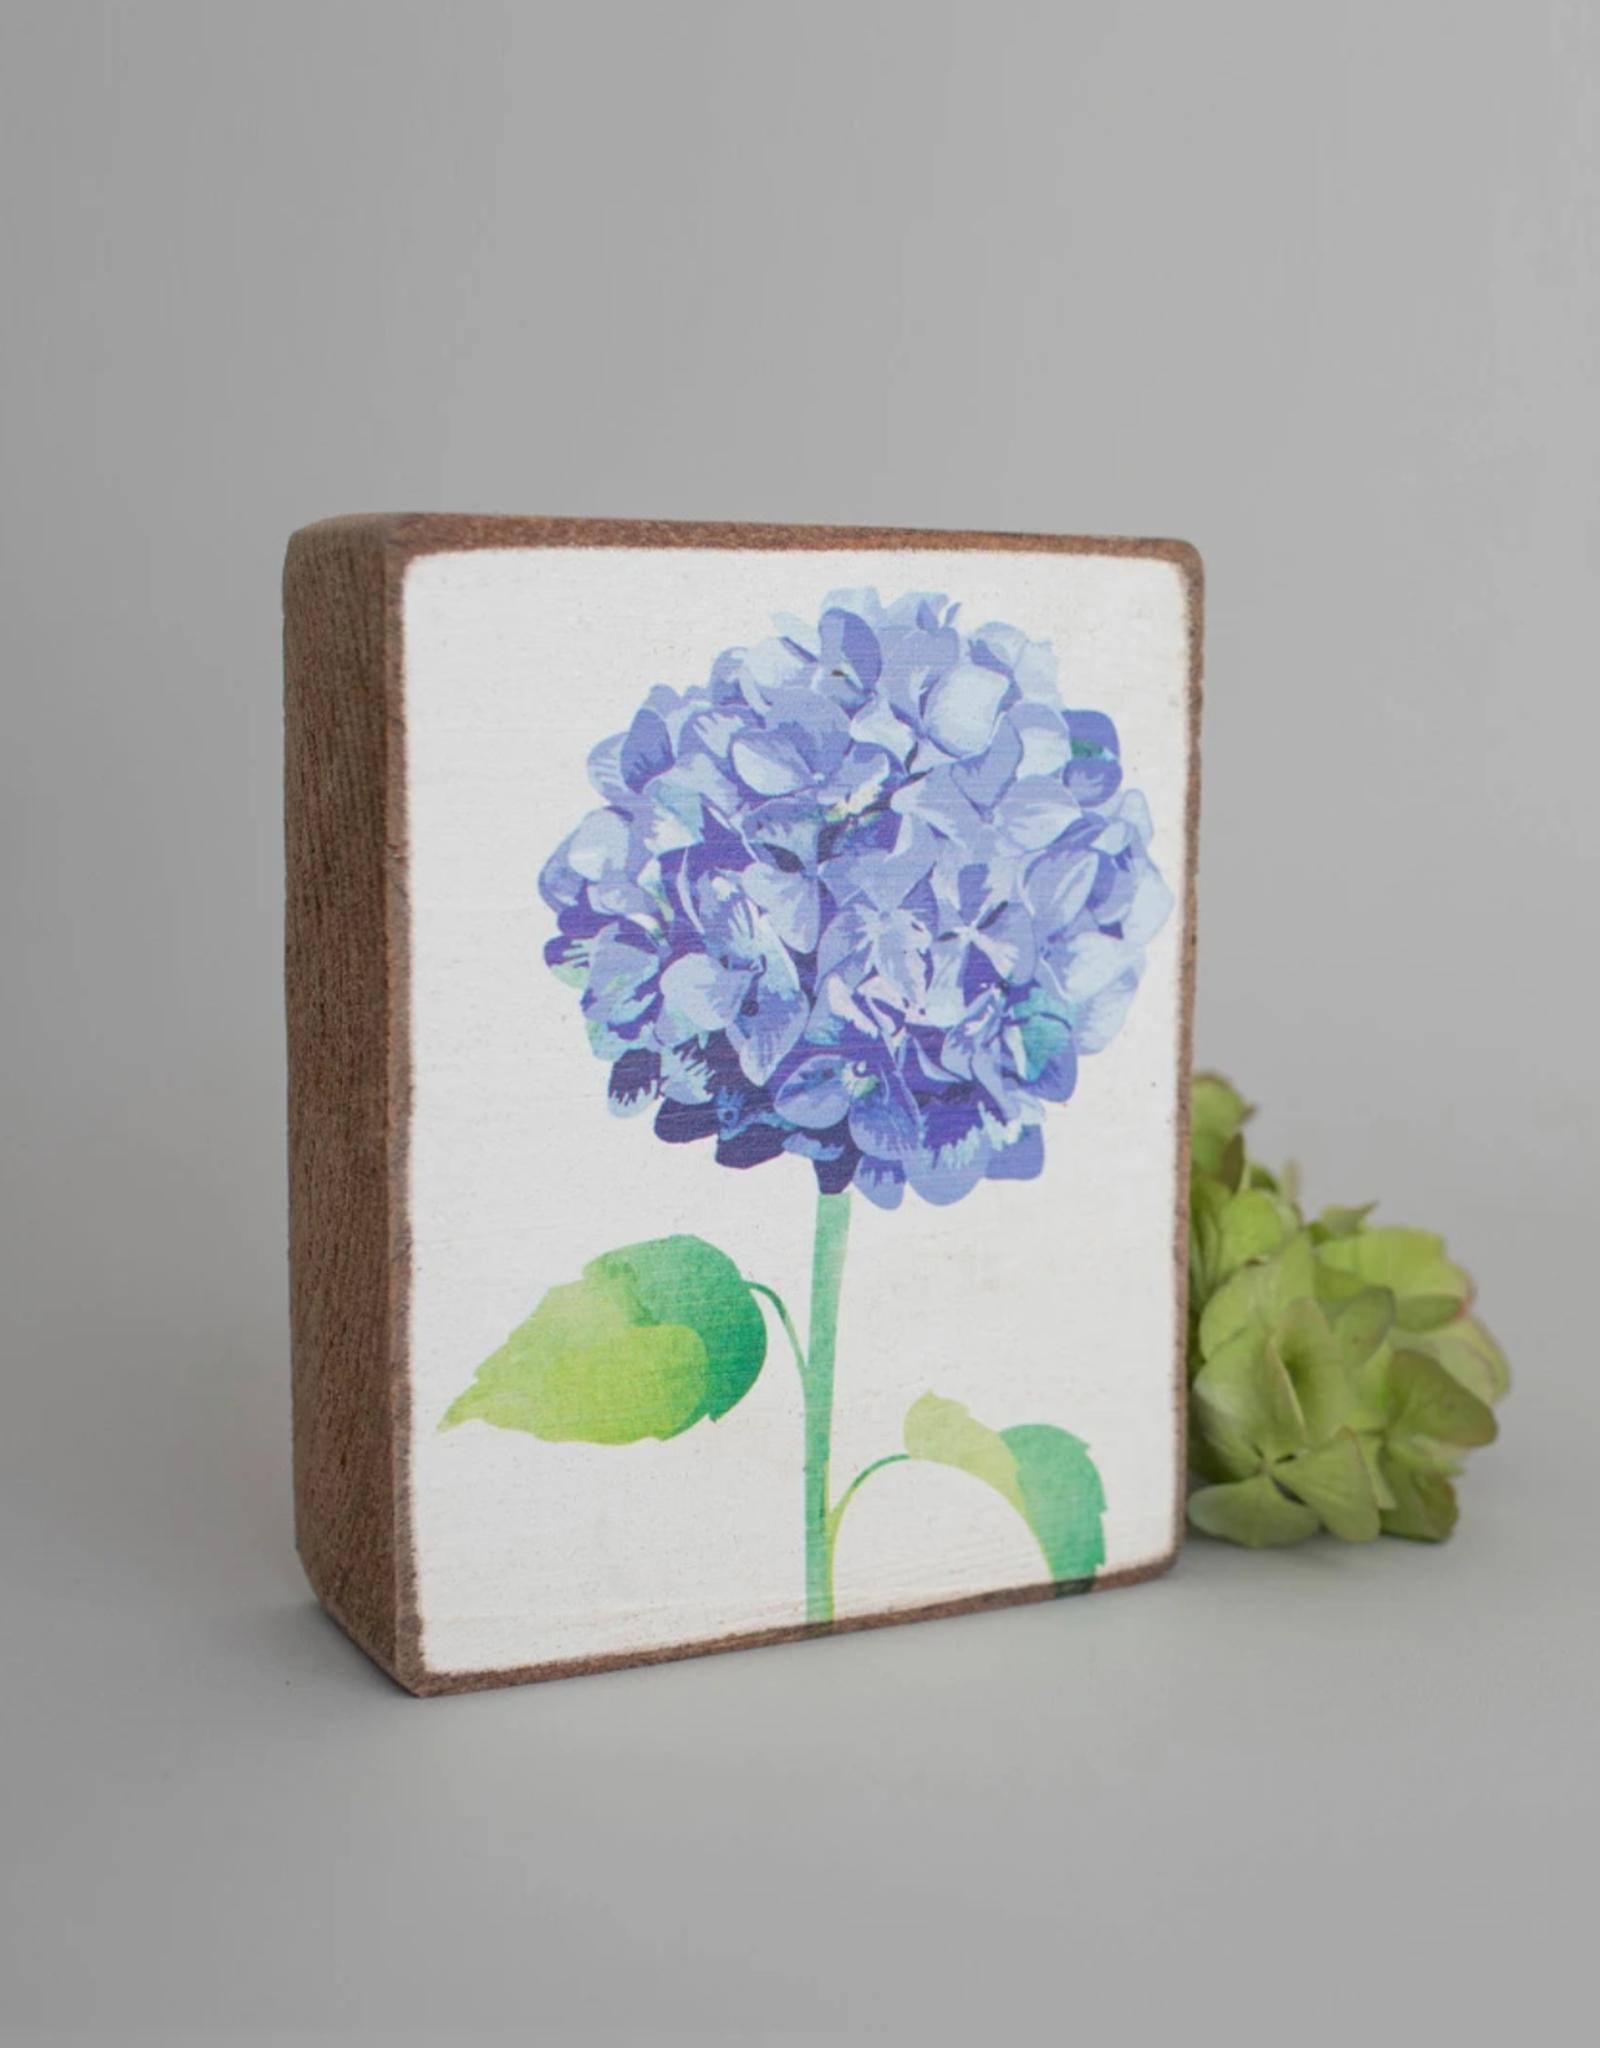 Rustic Marlin Rustic Marlin - Wood Block Blue Hydrangea